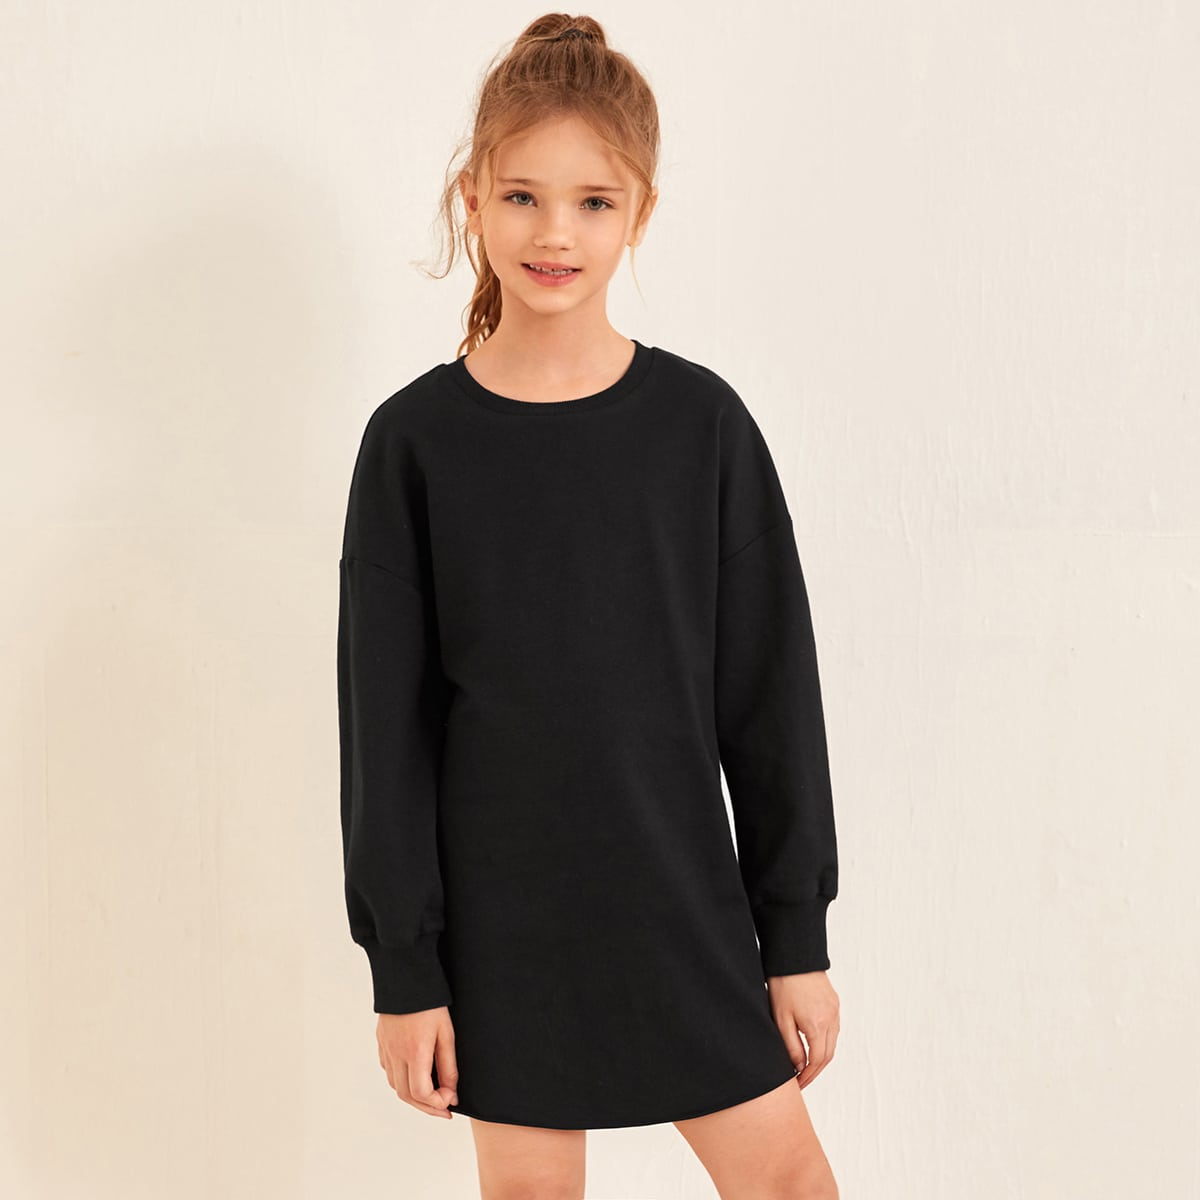 Robe sweat-shirt unicolore